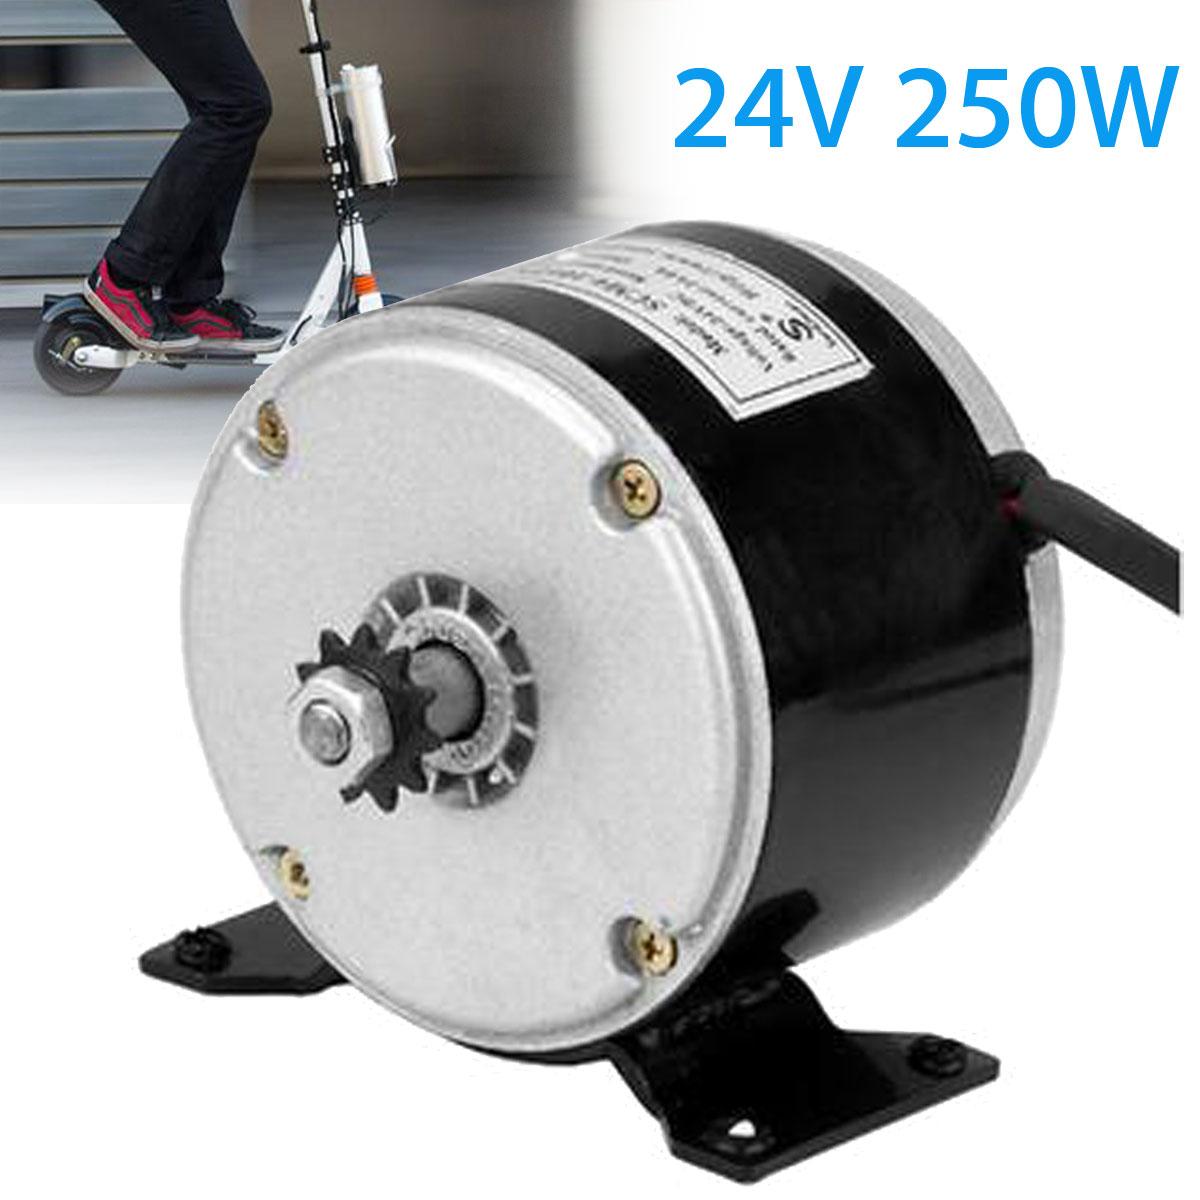 High Quality Brand New 24V 250W DIY Motor Permanent Magnet Generator For Micro Motor PMA